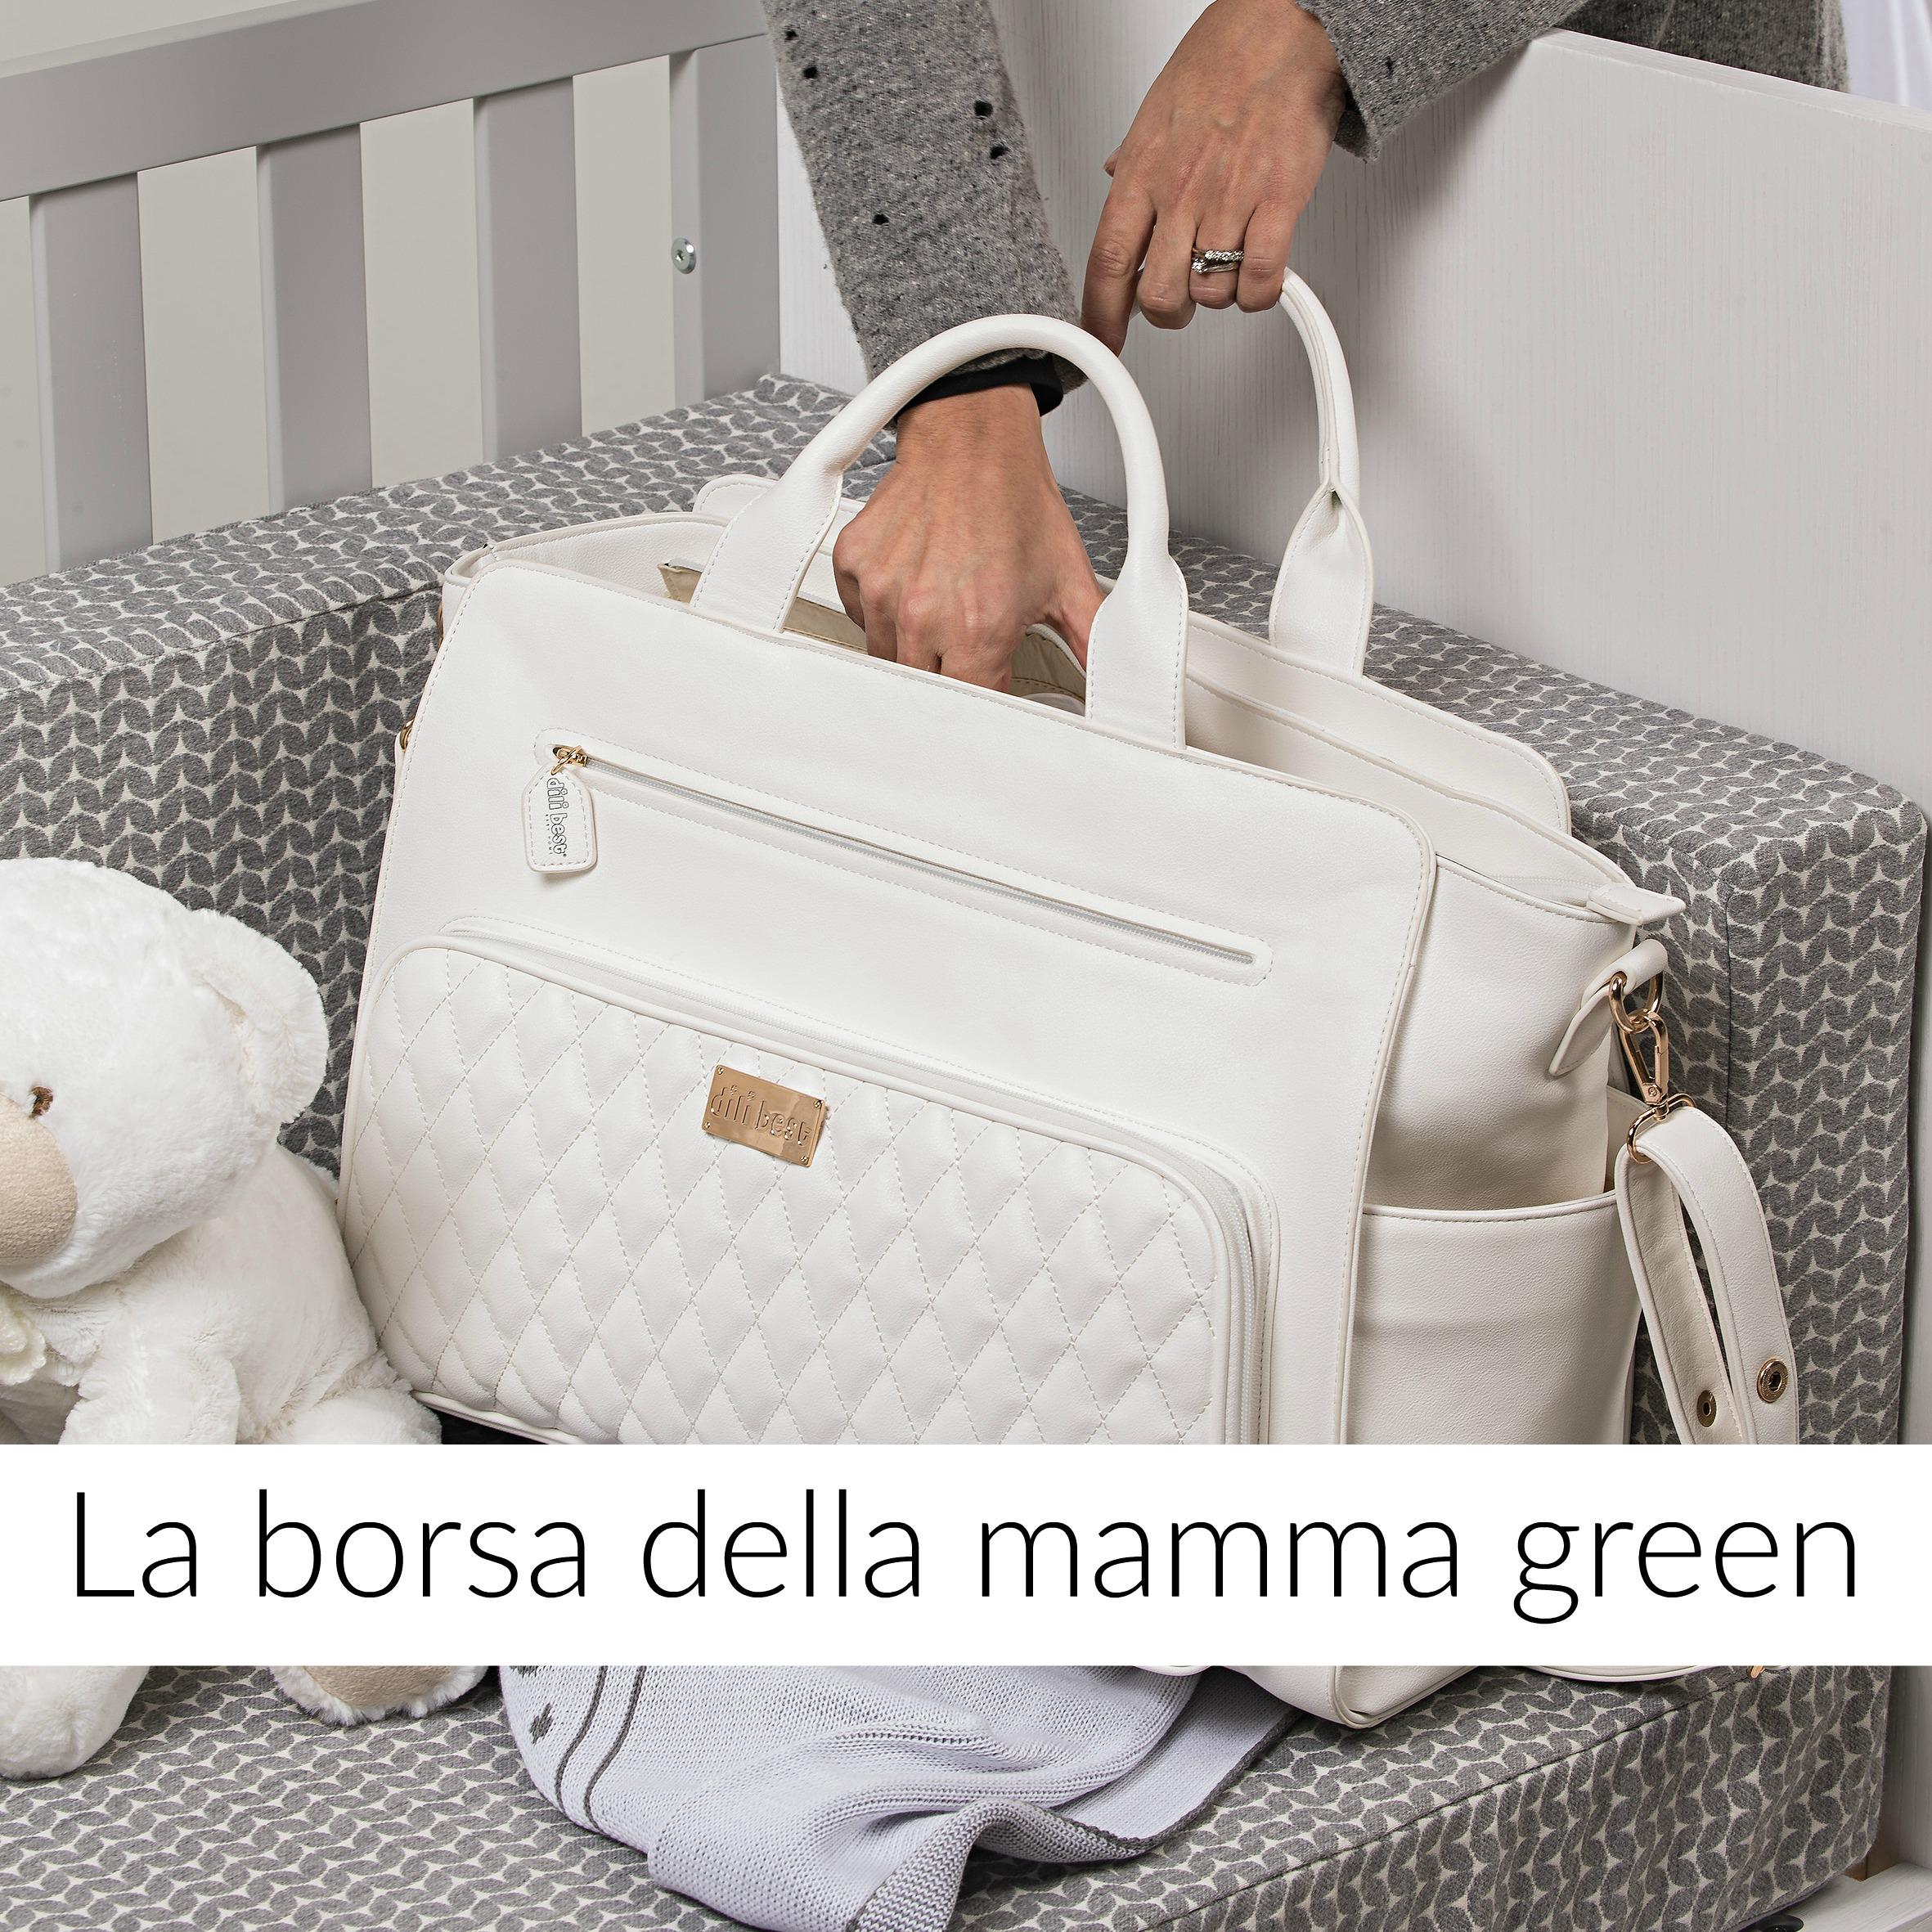 2afc2264d1 La borsa della mamma green - BabyGreen